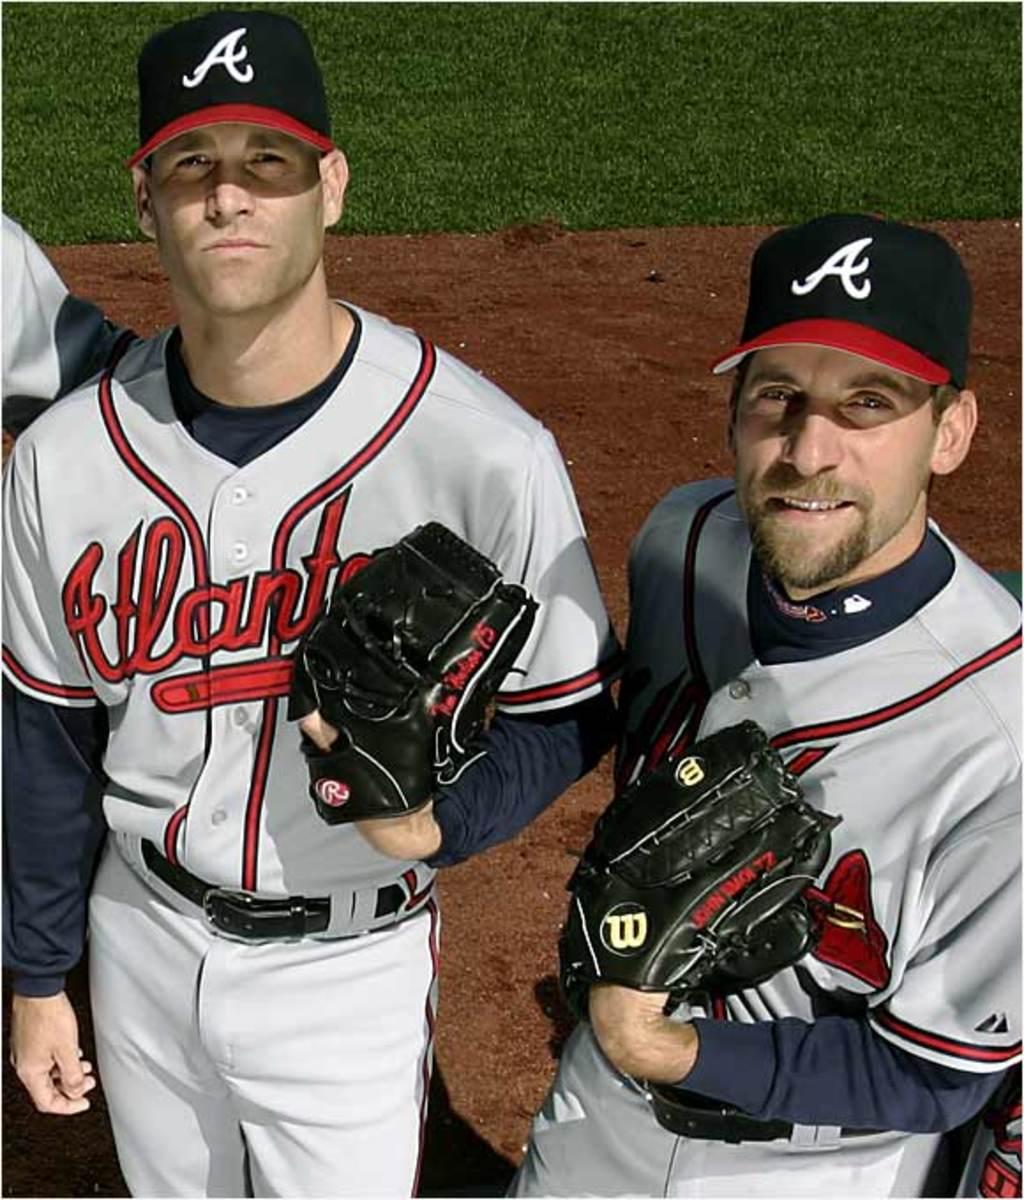 Tim Hudson and <br> John Smoltz